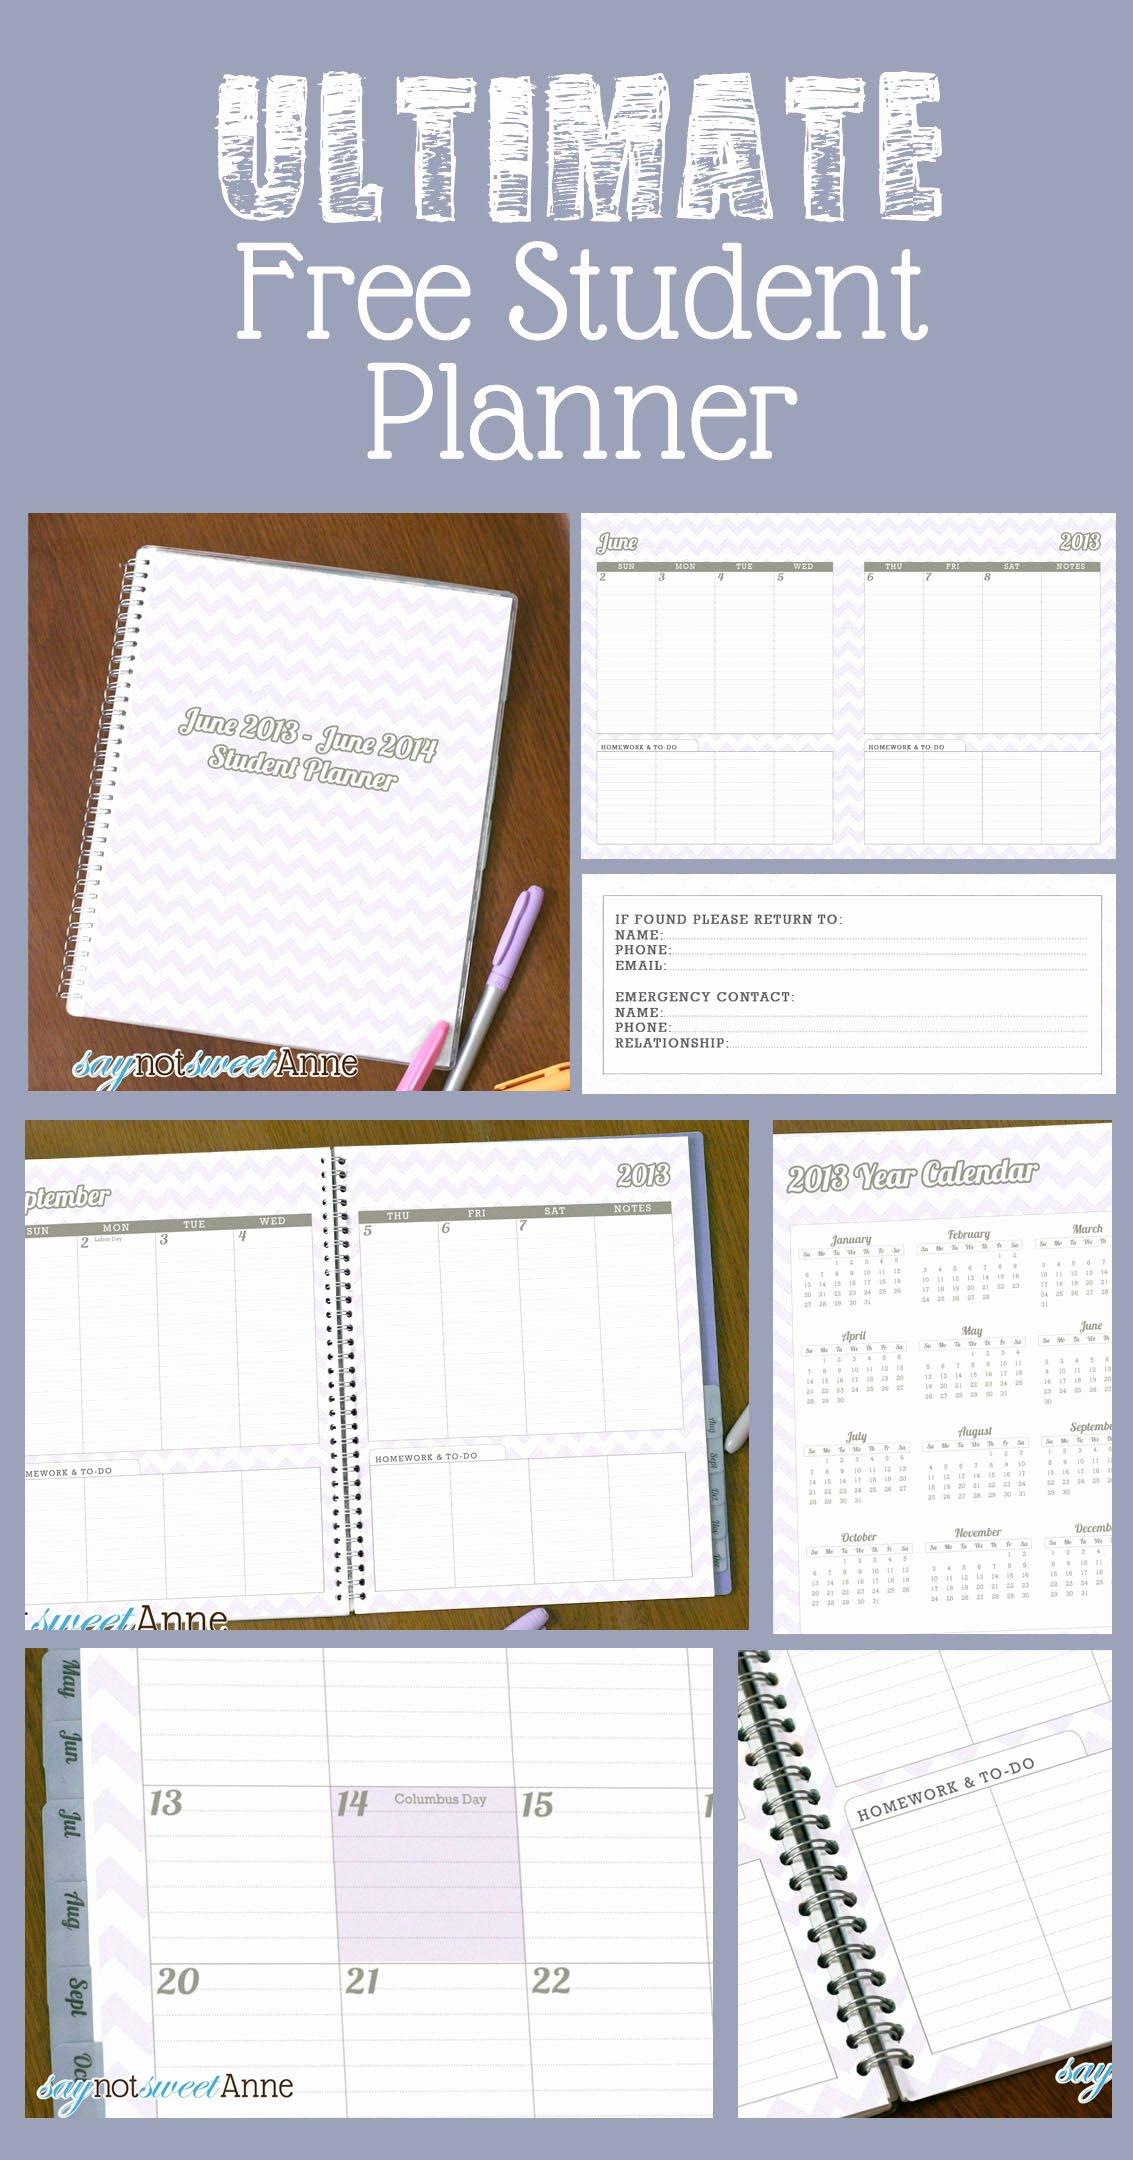 Printable Homework Planner for College Students Beautiful June to June Student Planner [2013 School Year] Sweet